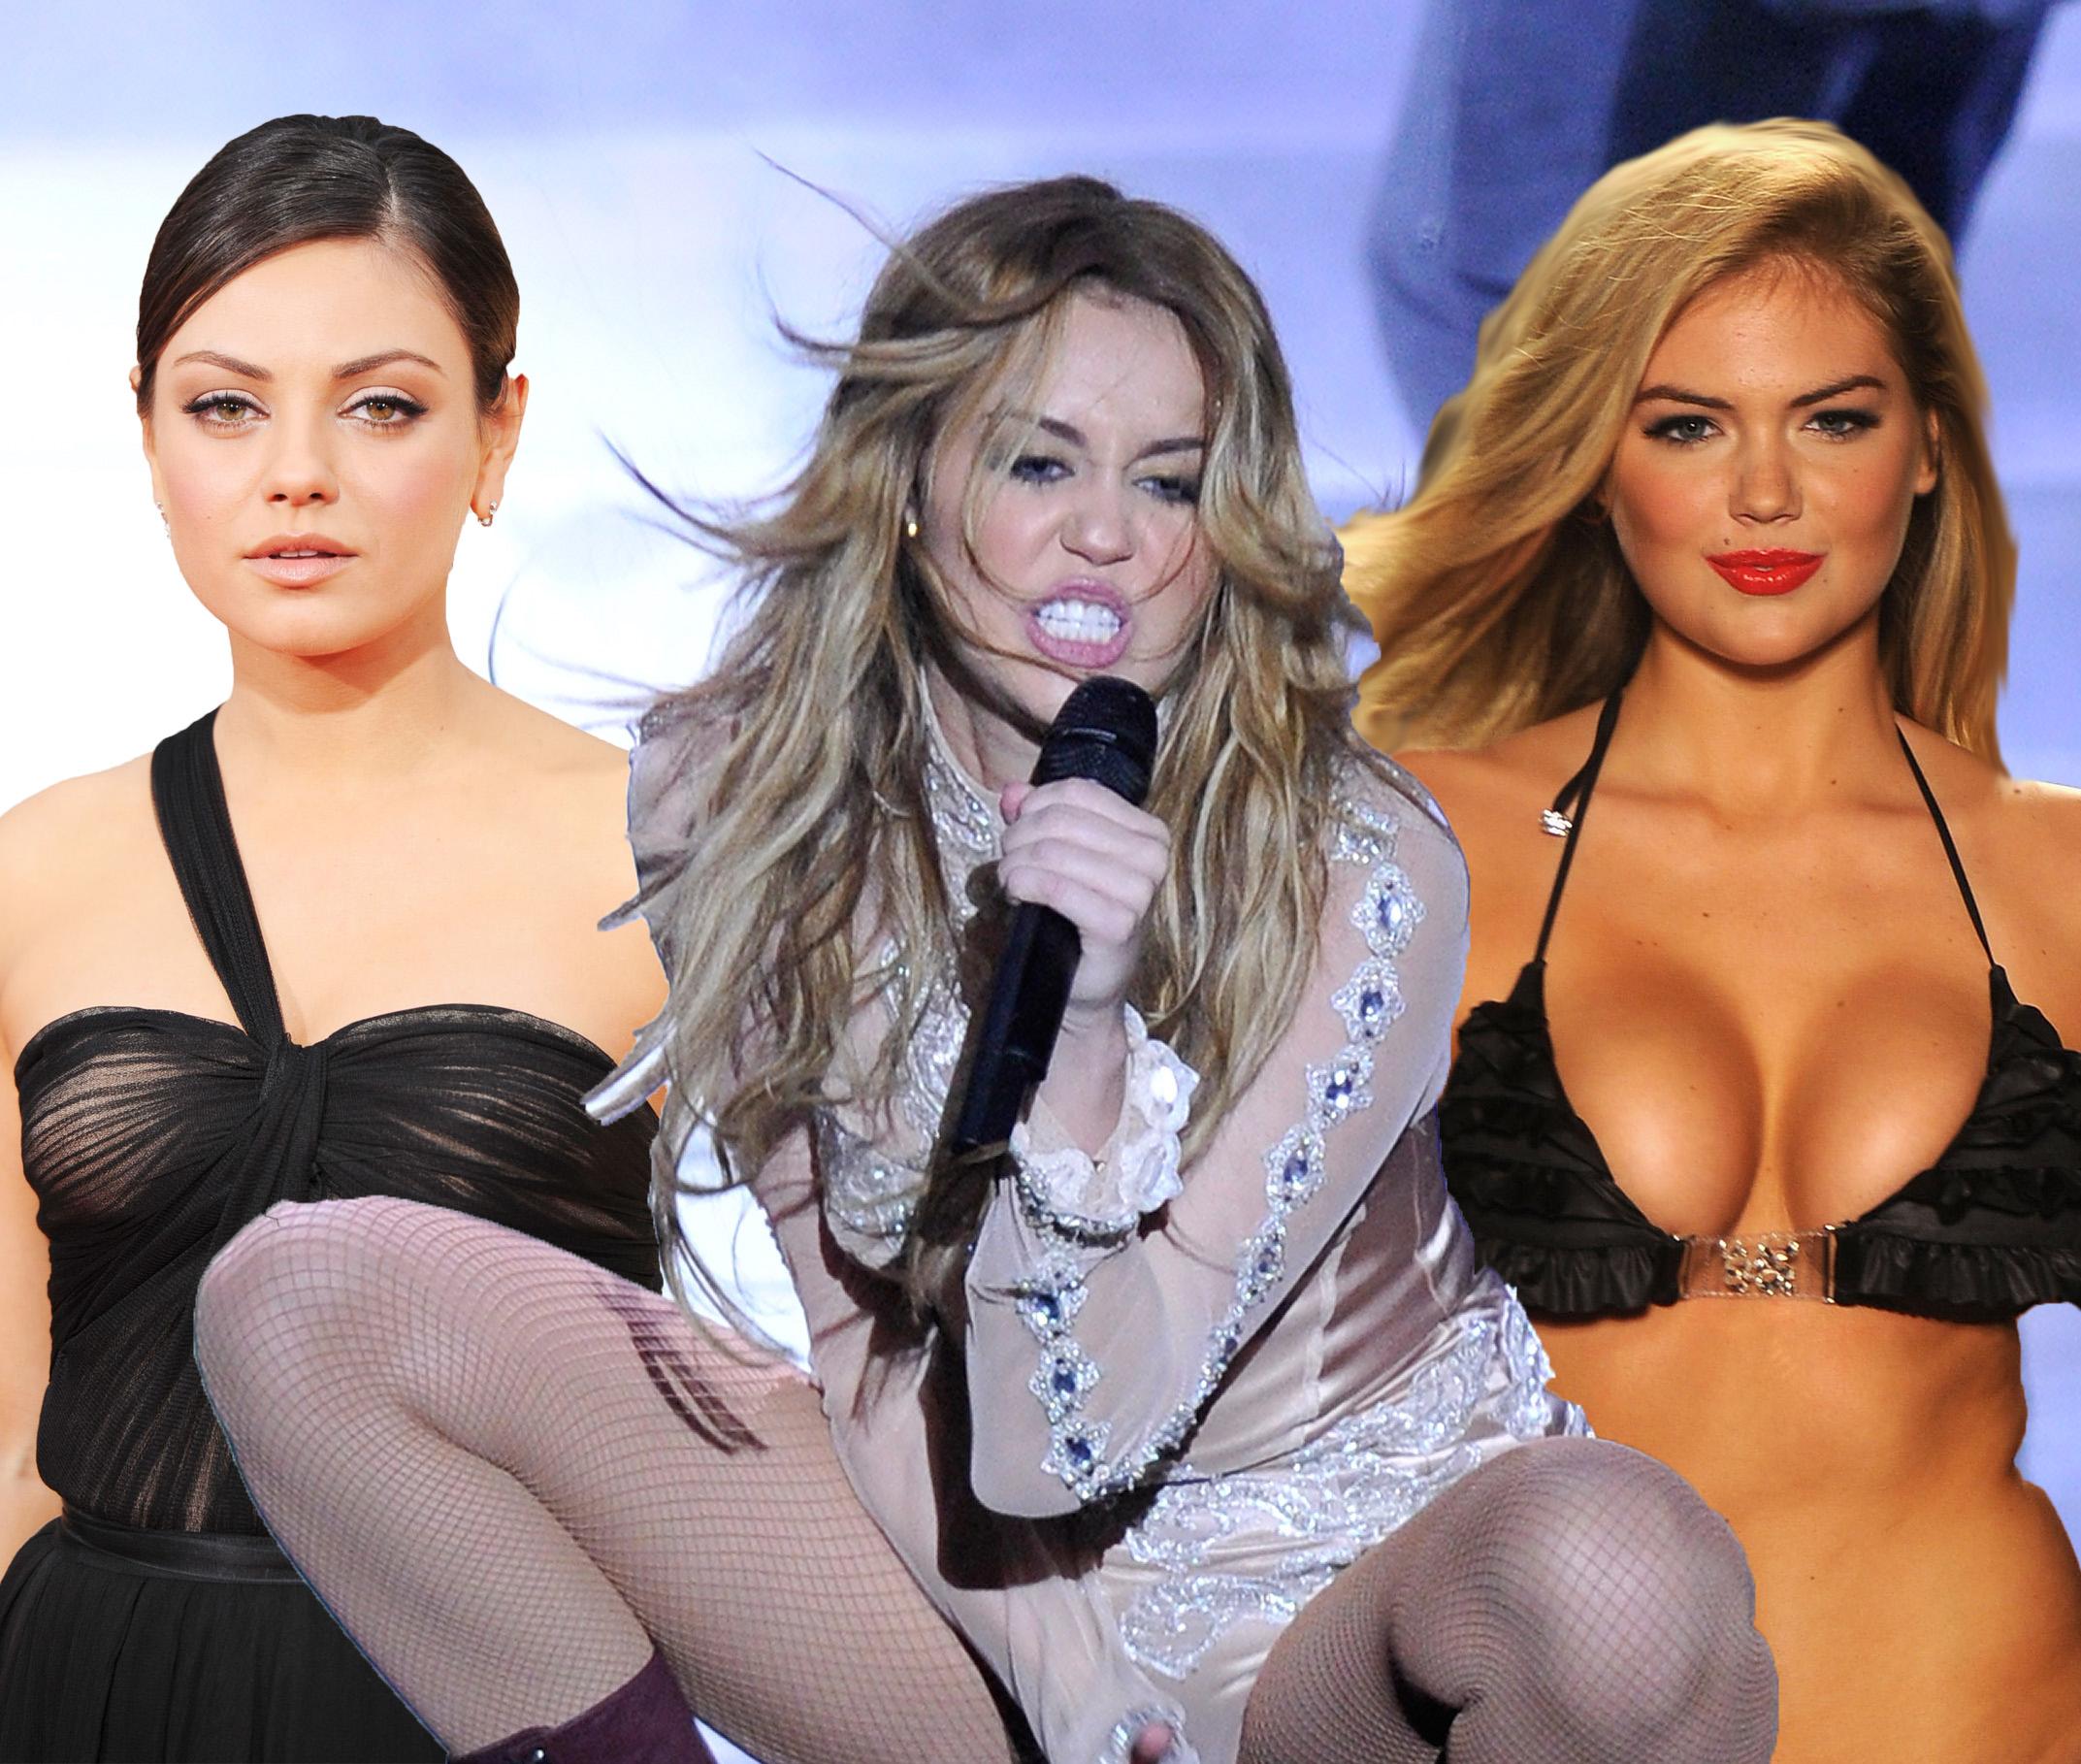 Gallery: Maxim's Hot 100 sexiest women